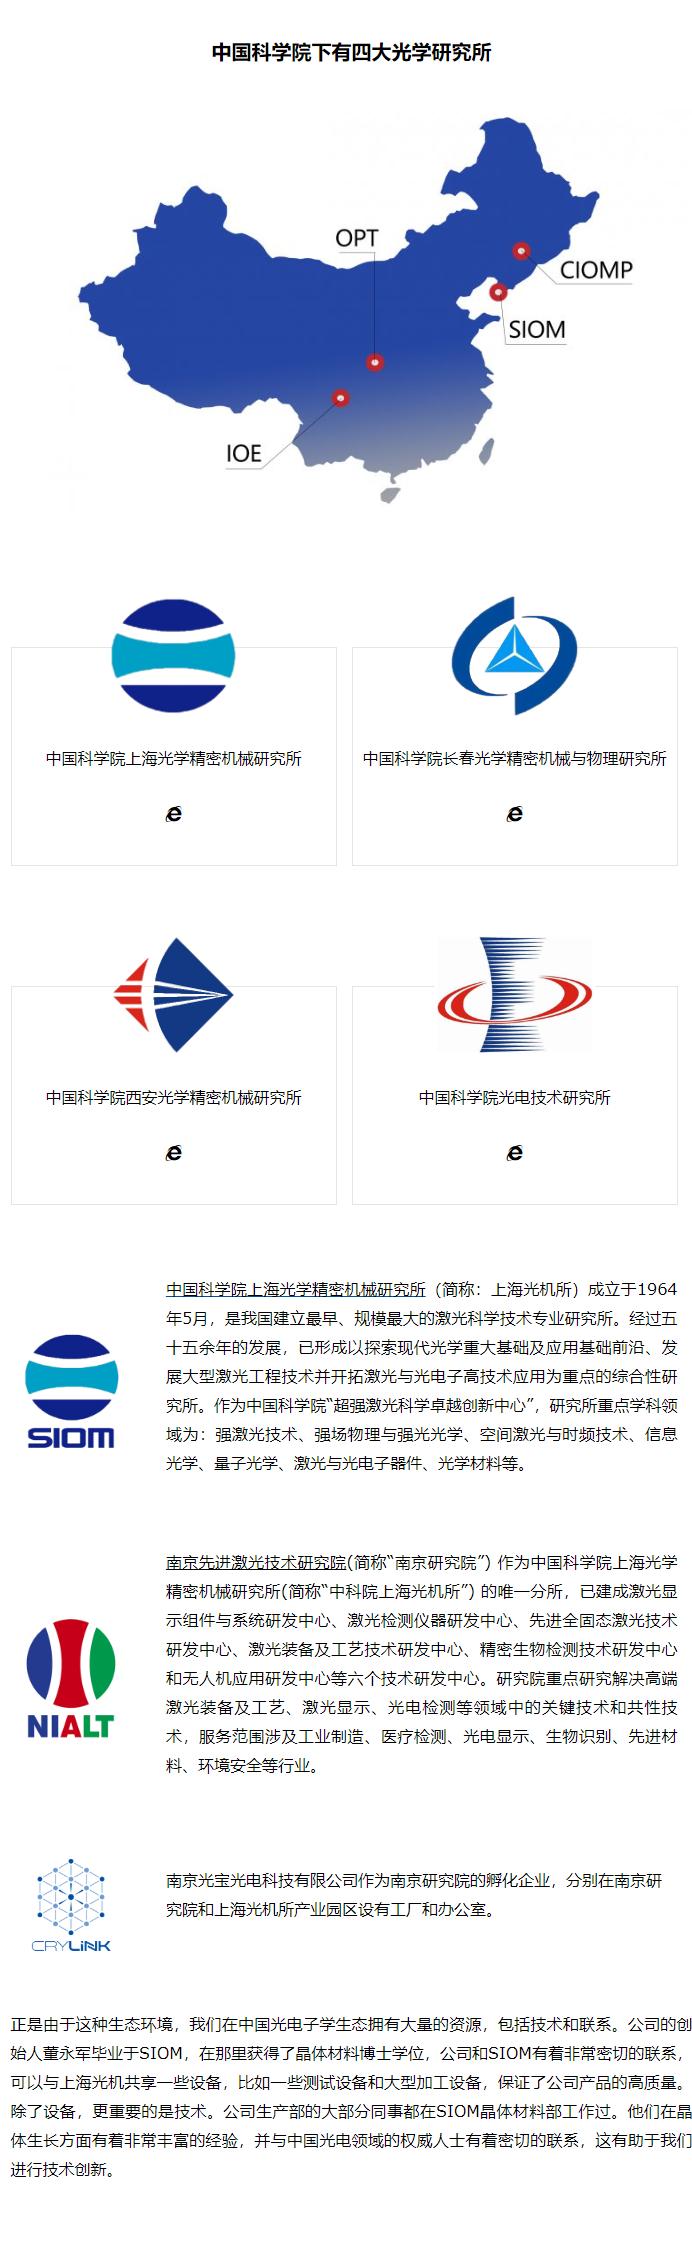 生态环境-laser-crylink.cn-南京光宝